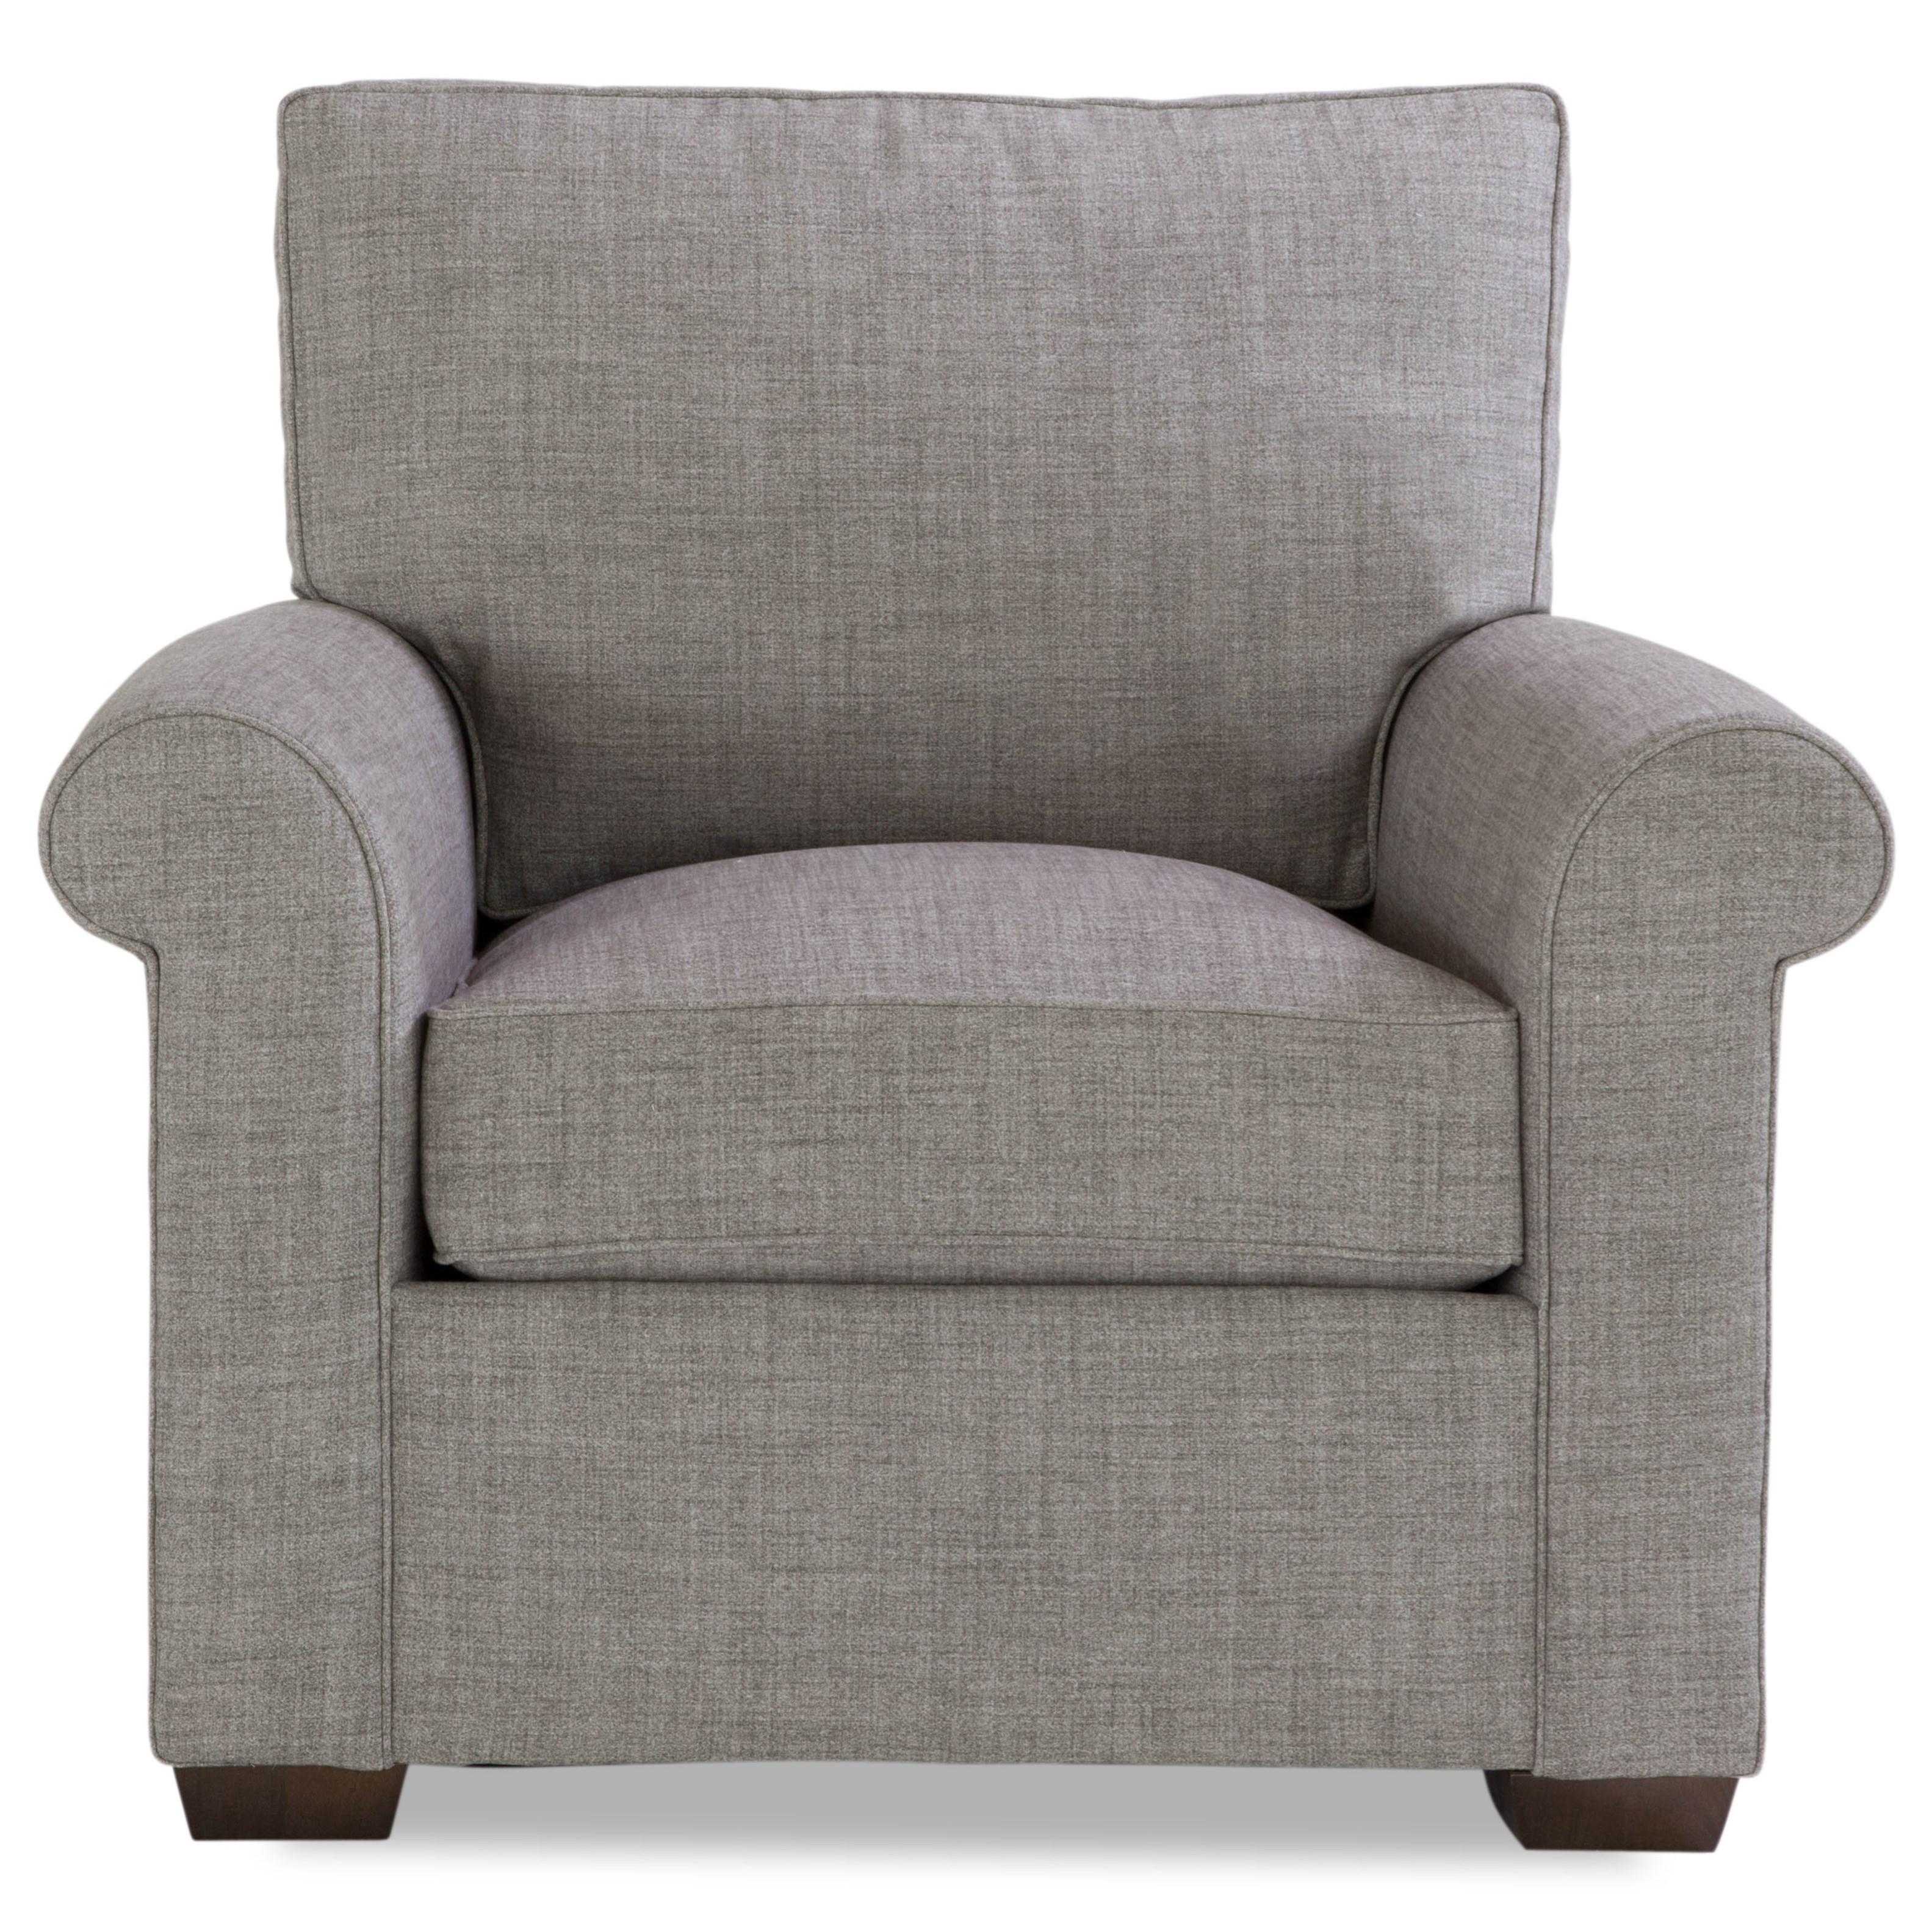 Plush Chair w/ Rolled Arms by Geoffrey Alexander at Sprintz Furniture